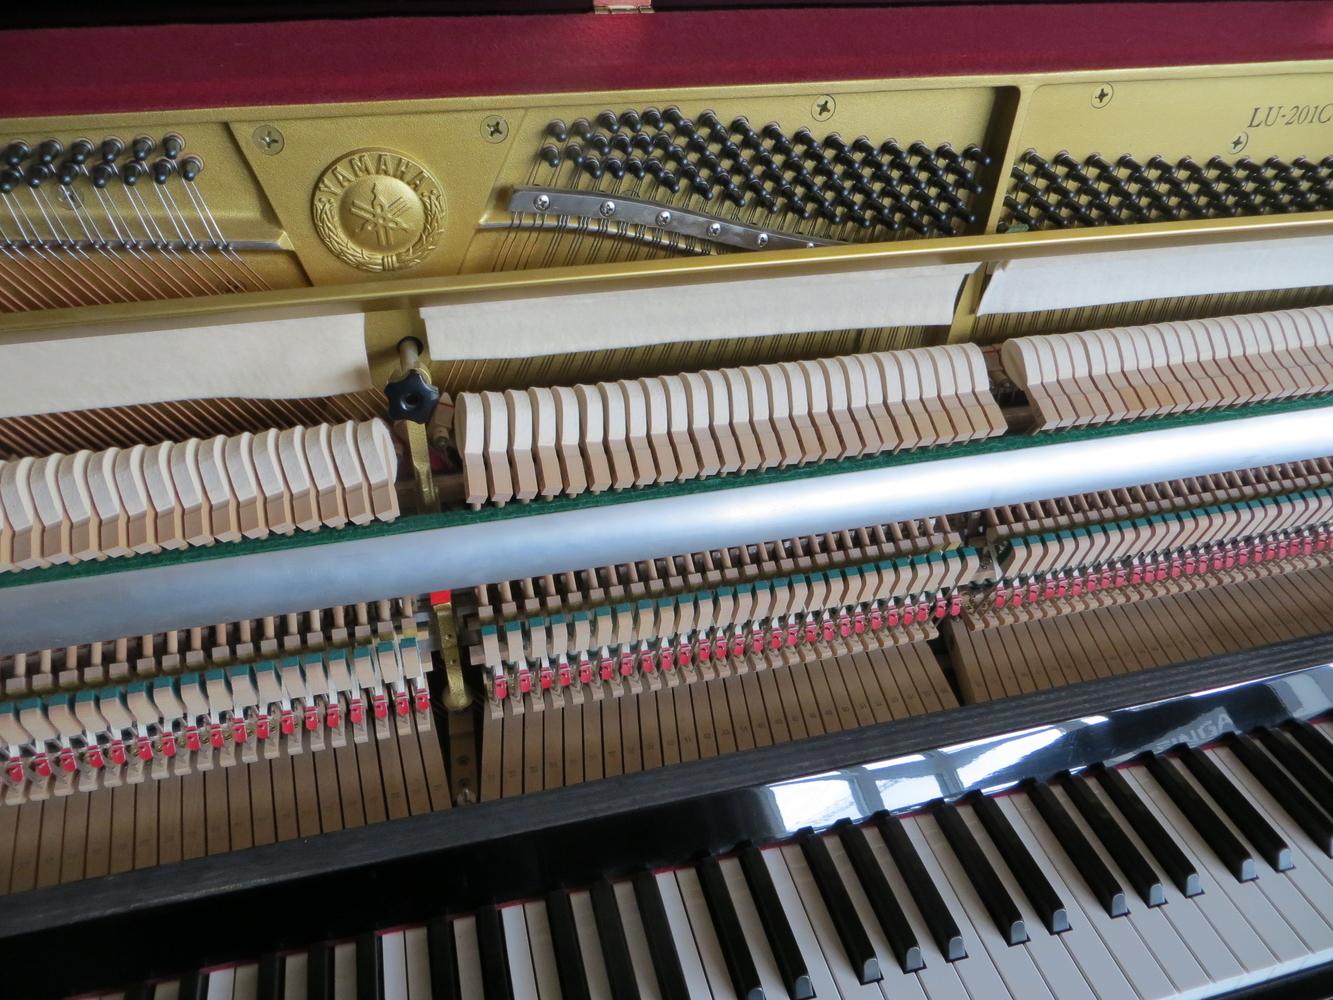 Yamaha, Mod. LU-201C Klavier